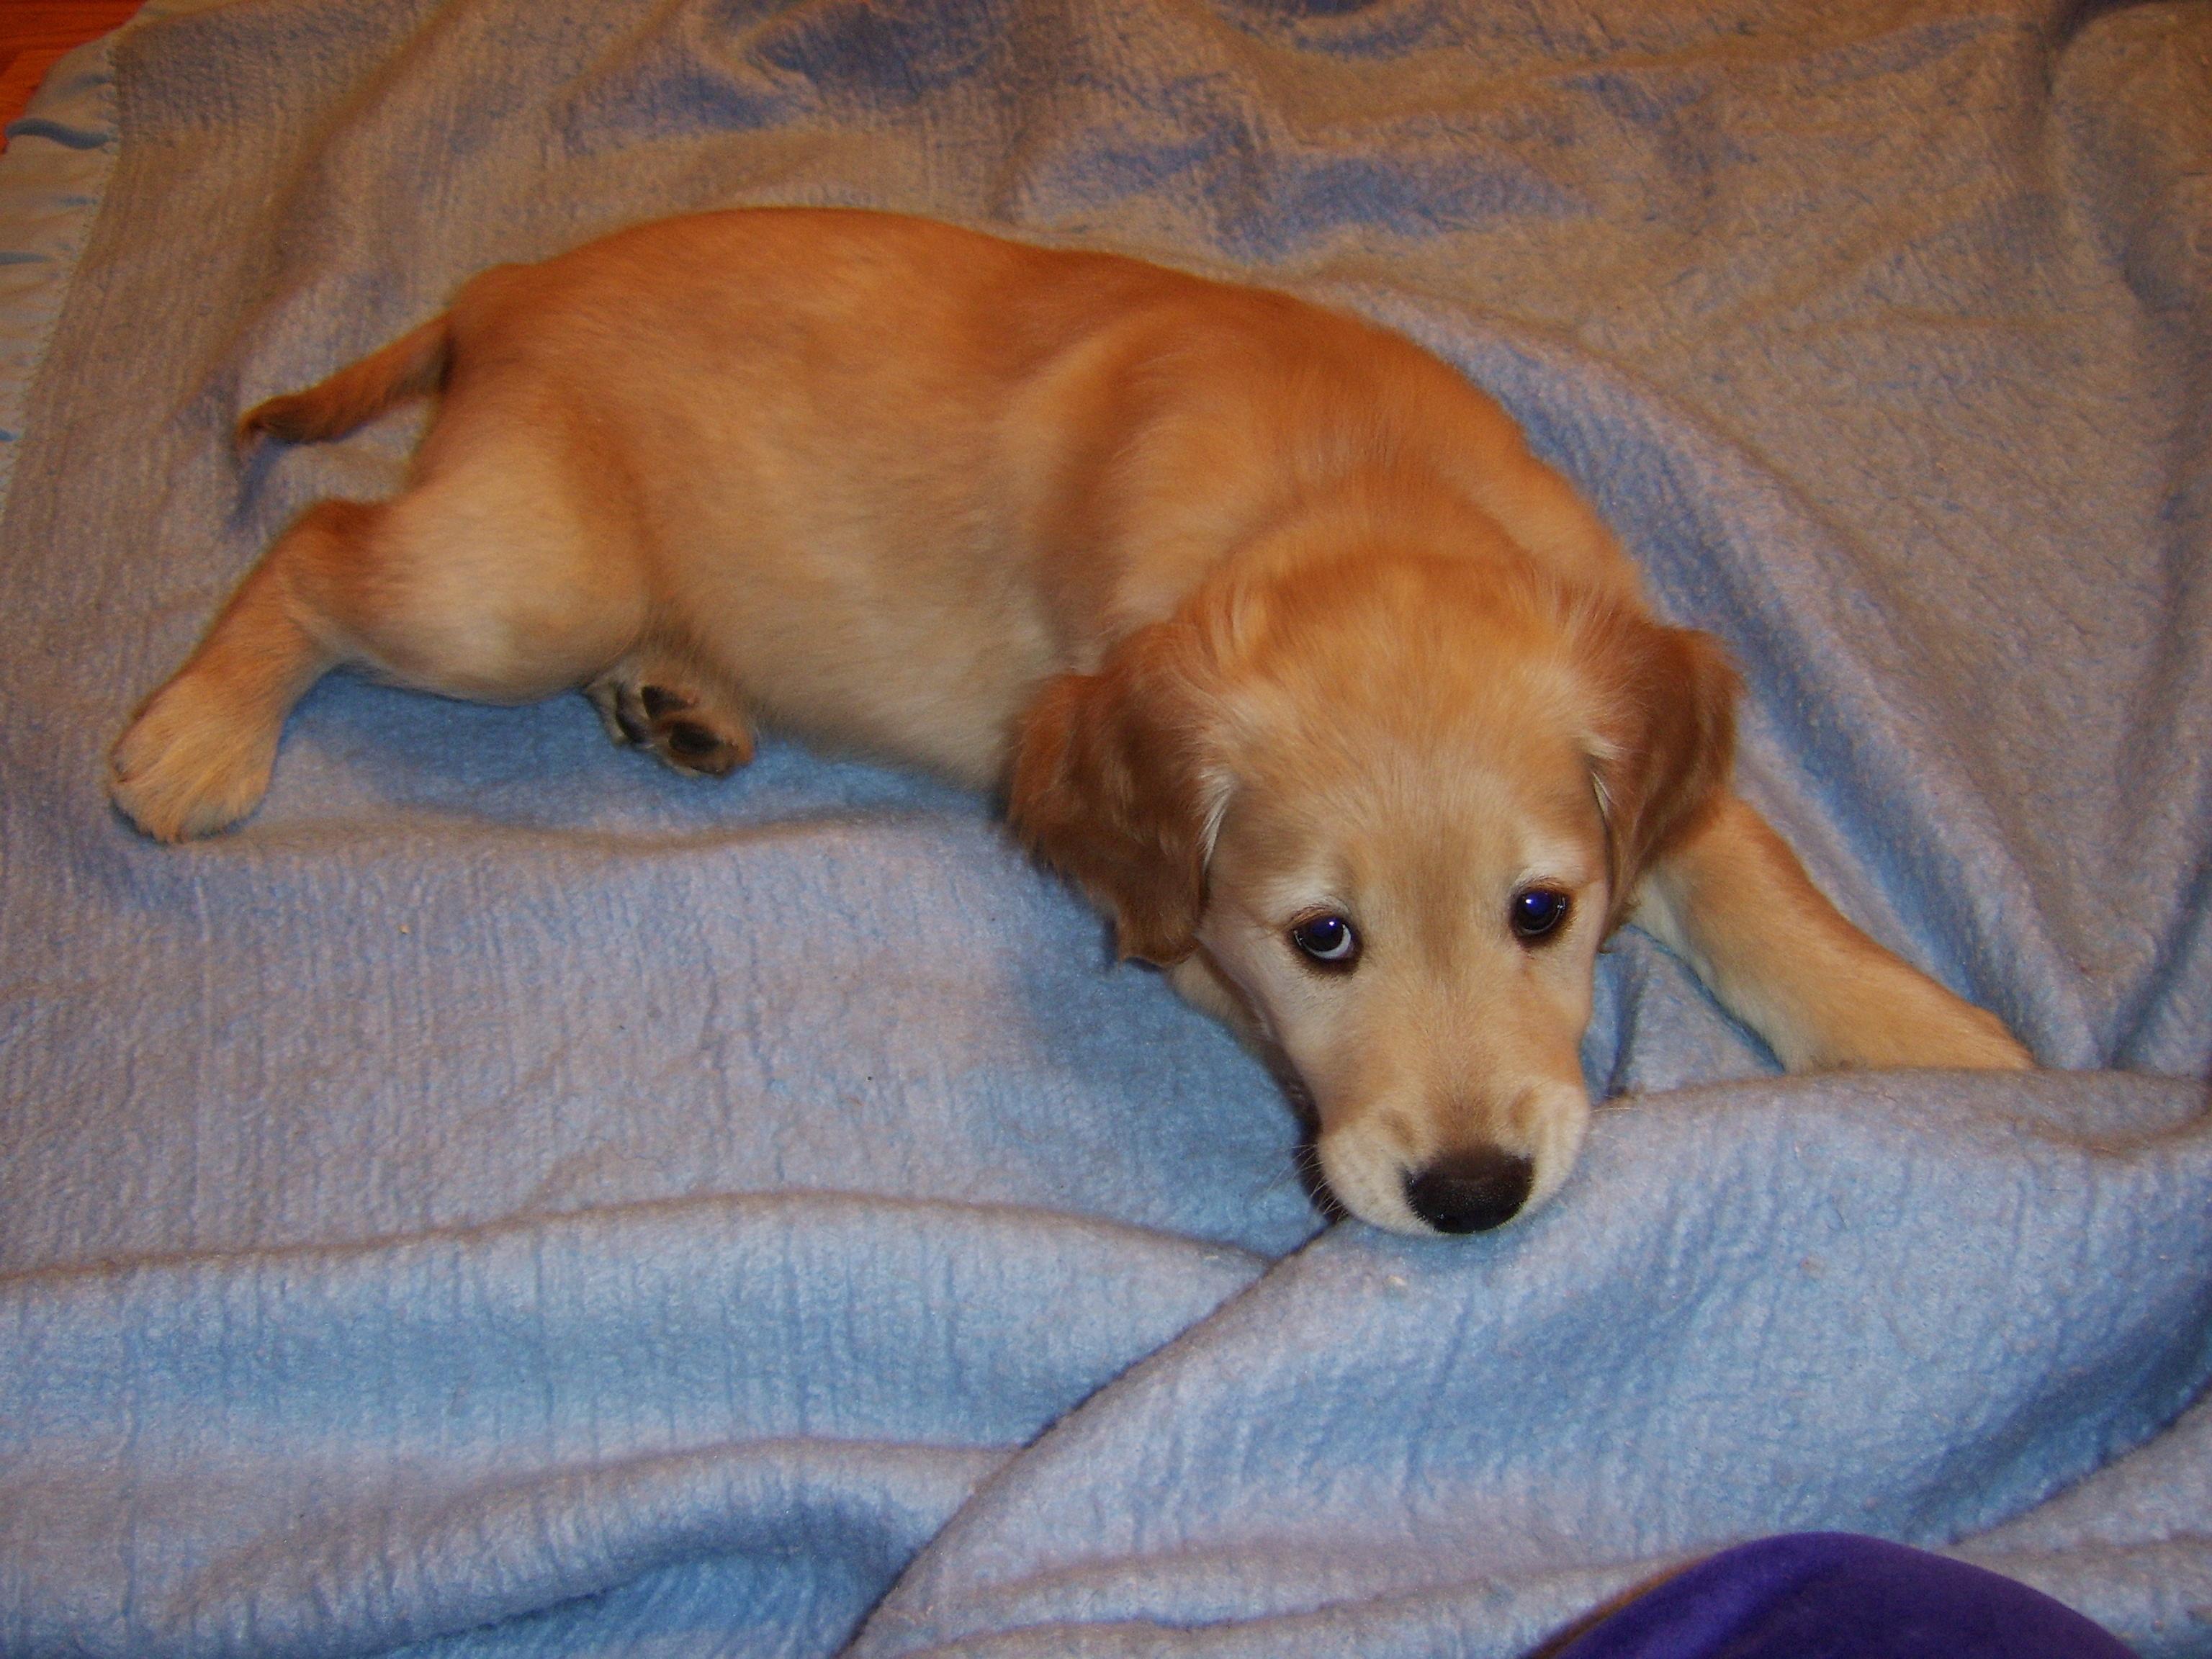 Resting Pup on Blanket - Joy's Pics of Puppy